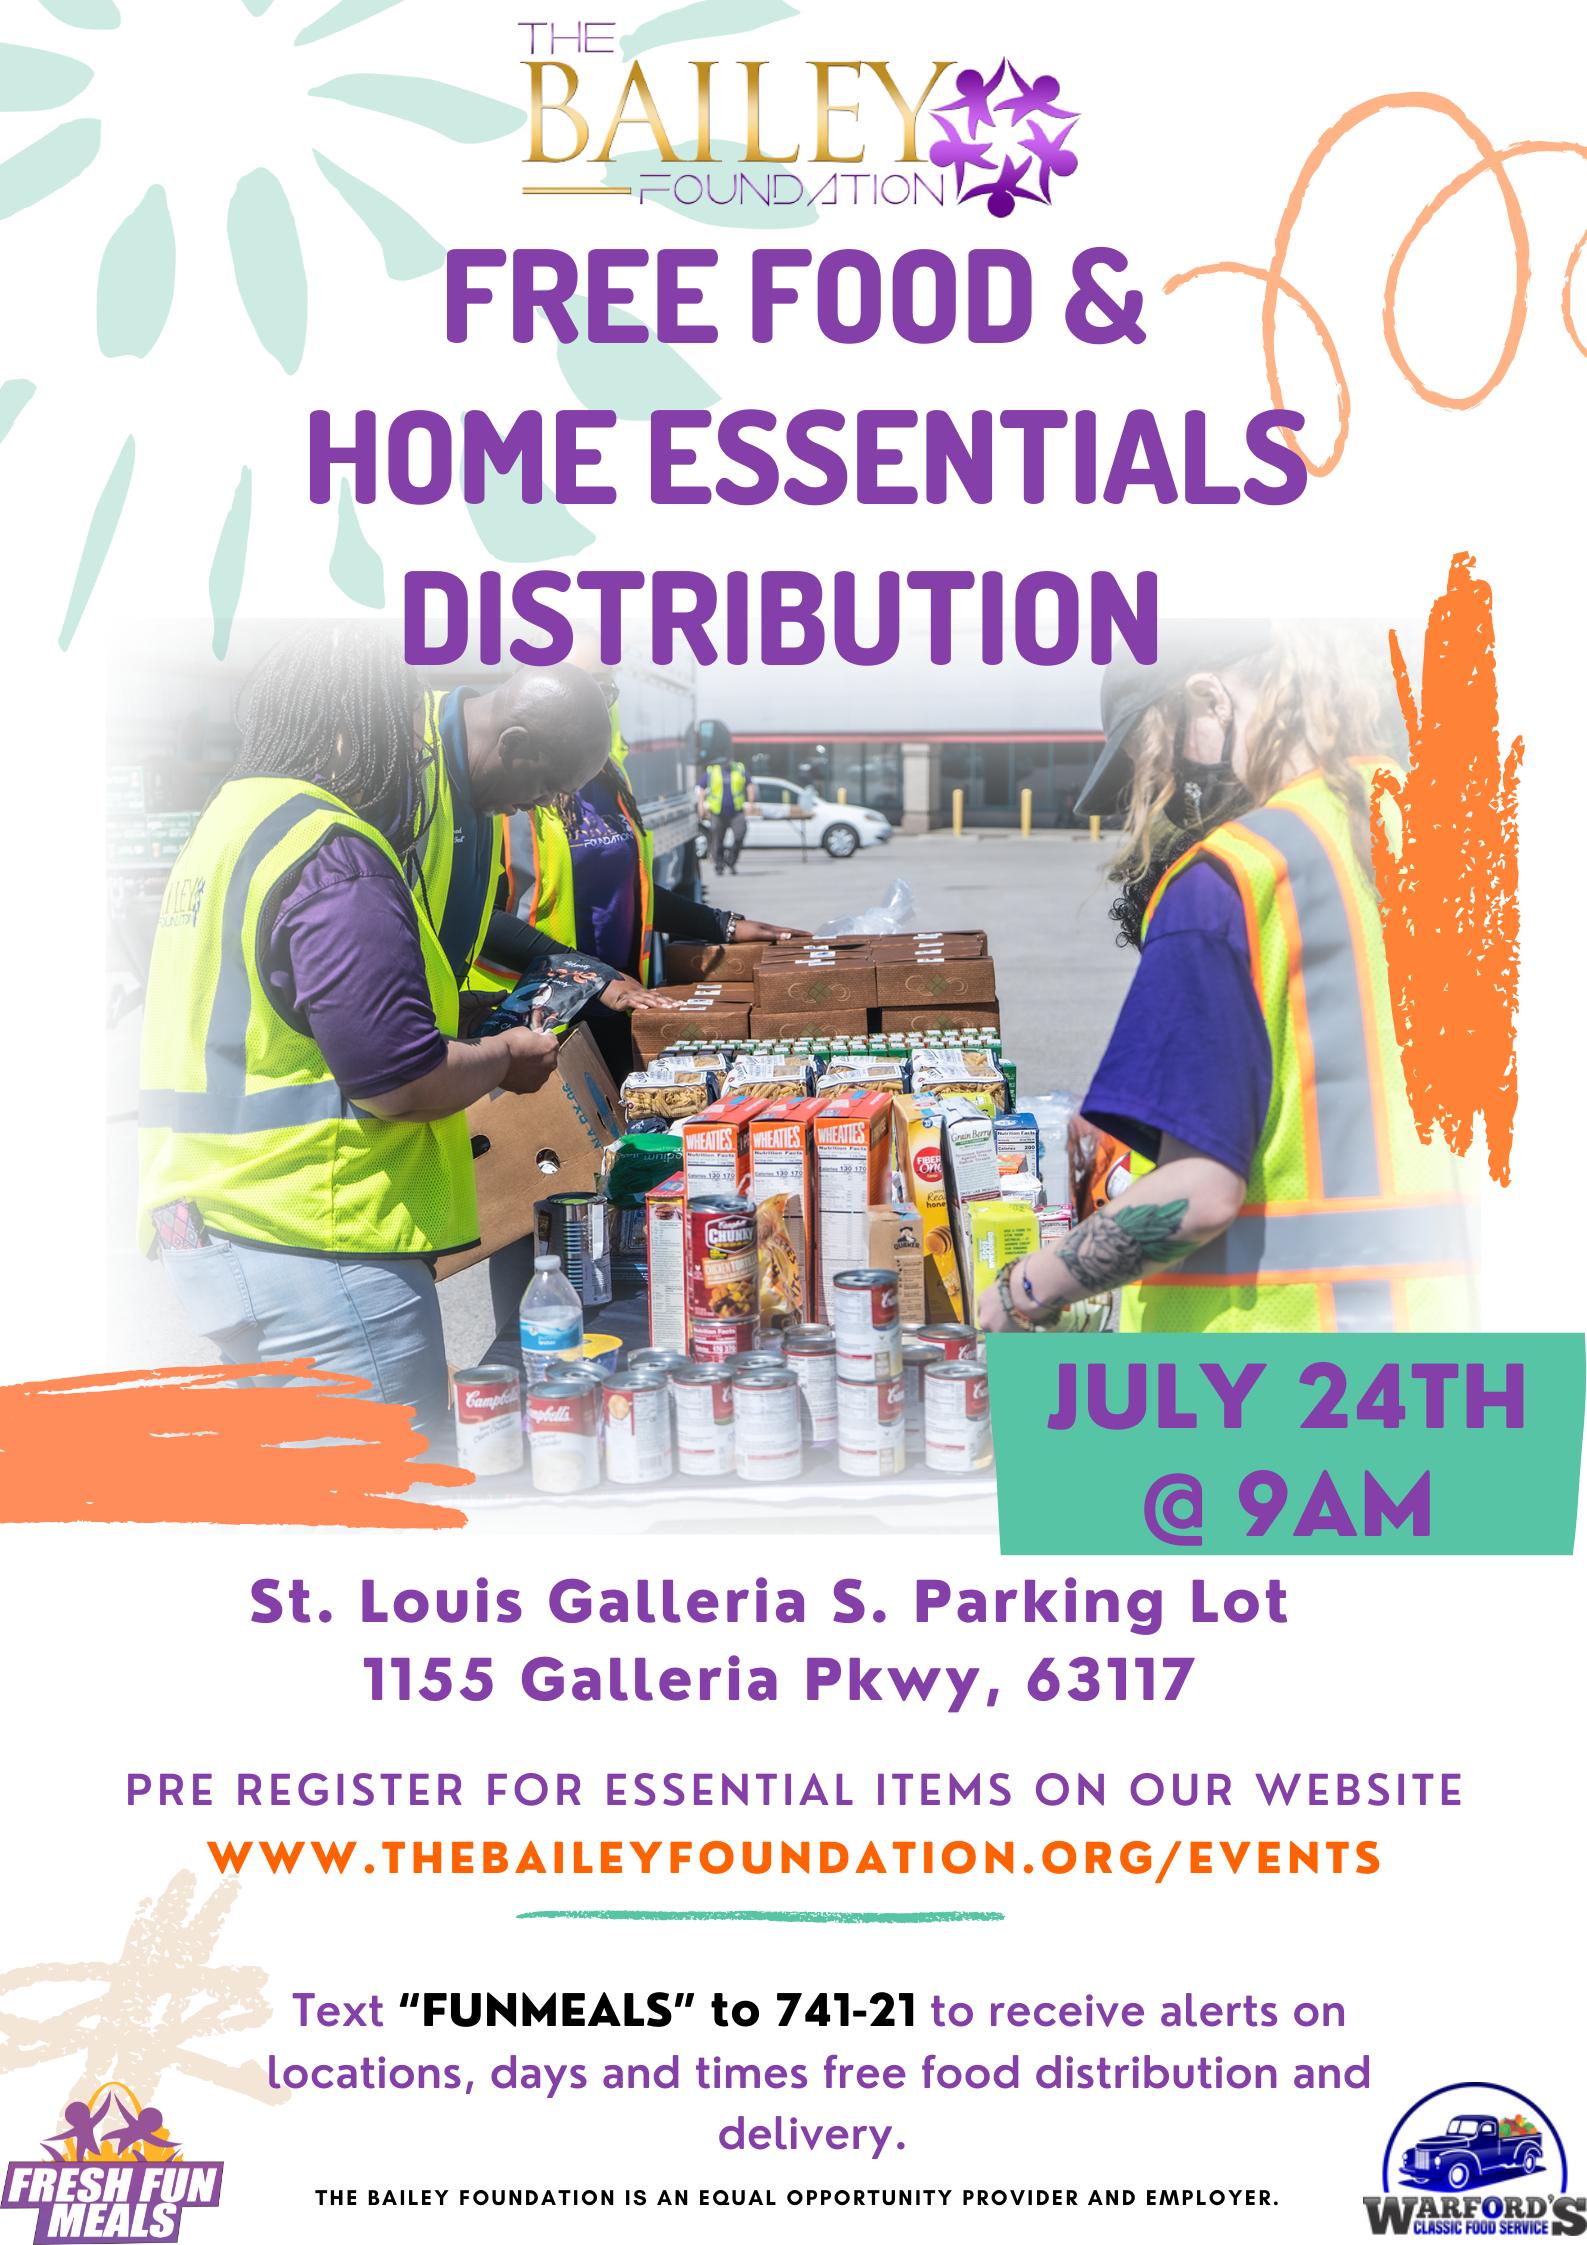 Free Food & Home Essentials Distribution